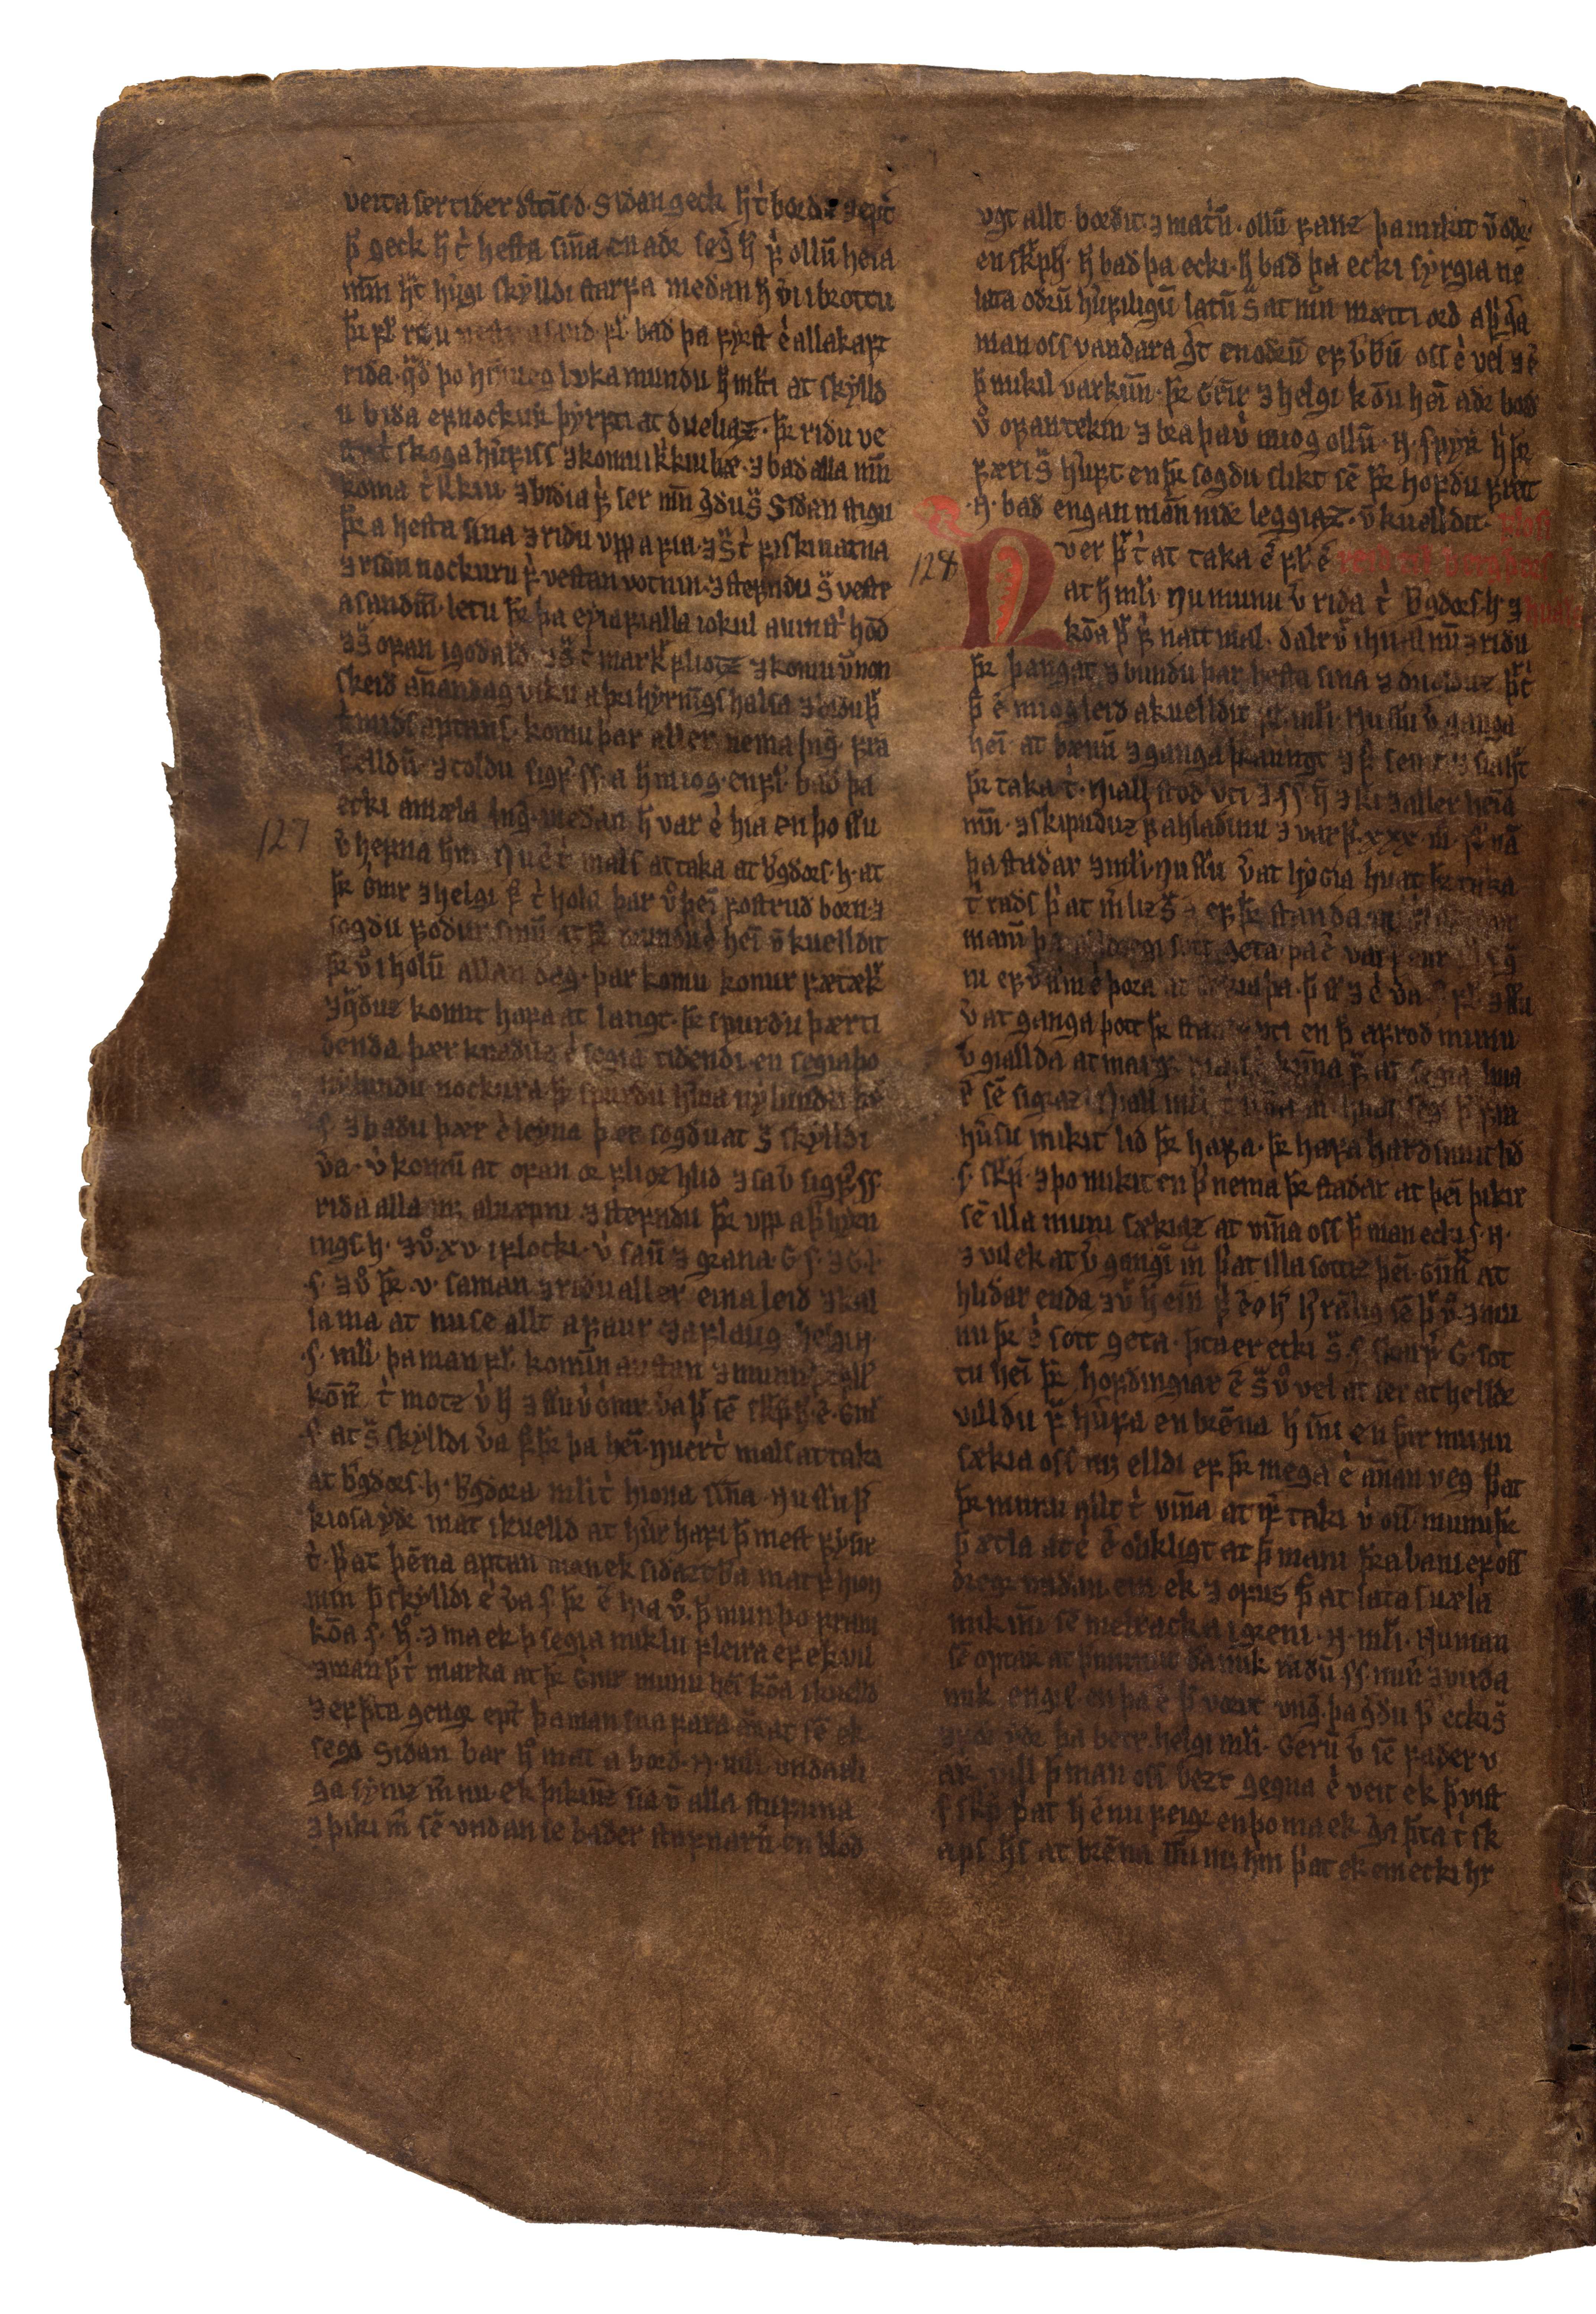 AM 132 fol - 44v